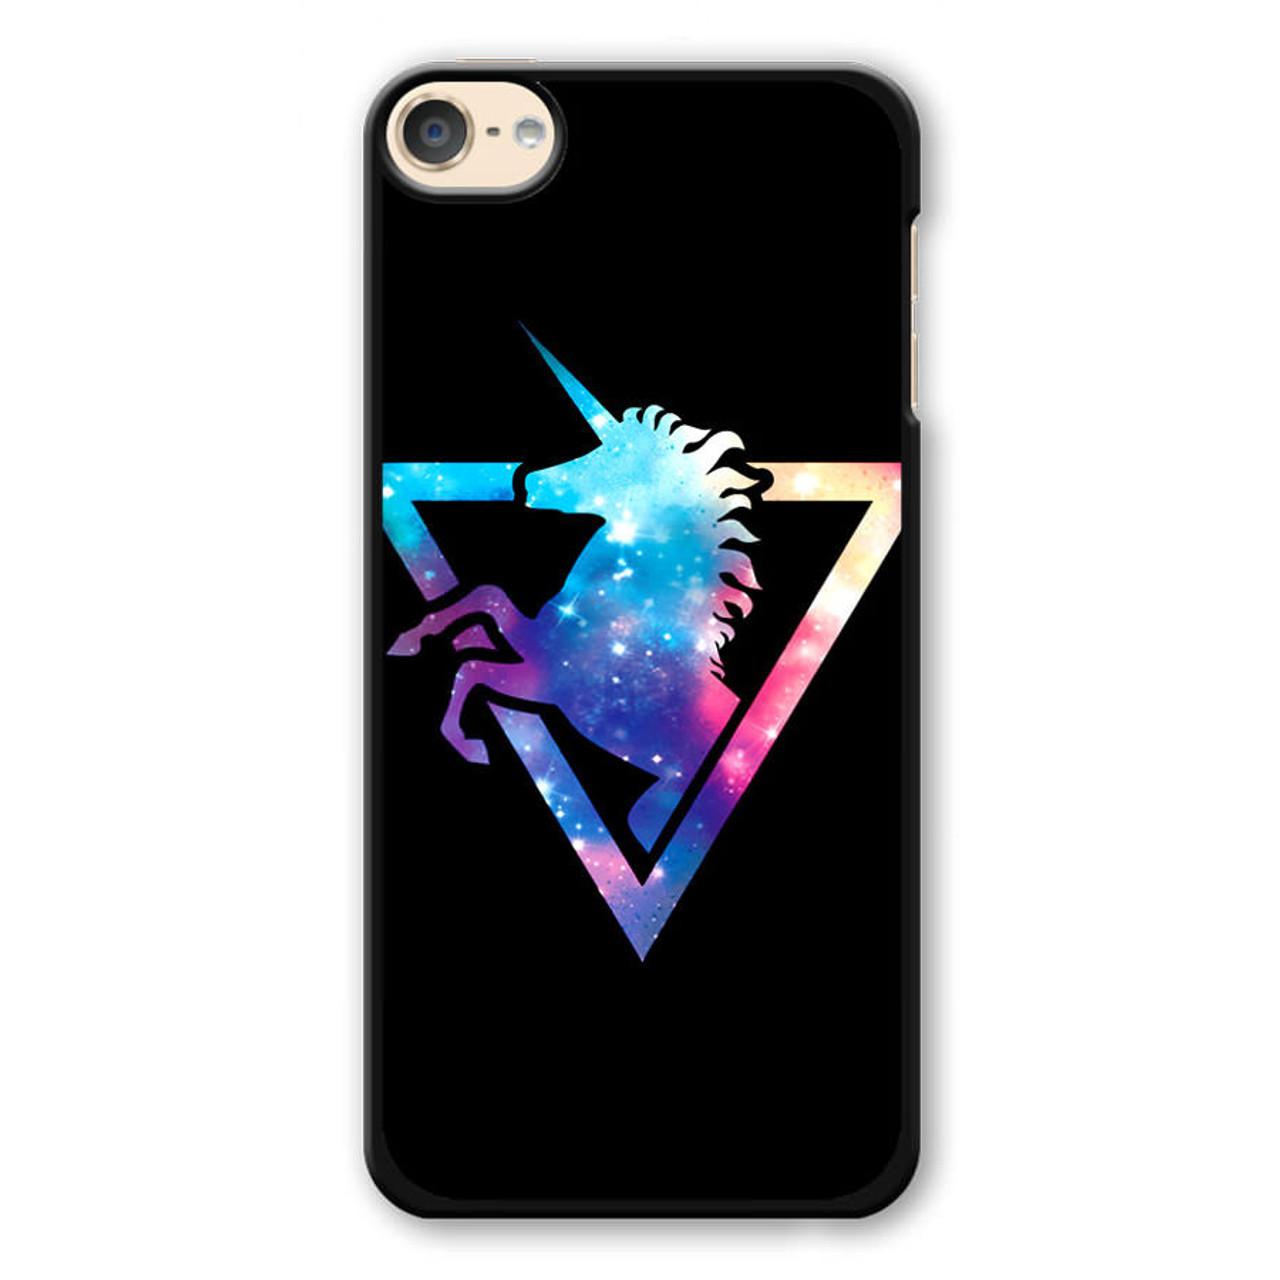 new arrivals 0bc7b 087ca Galaxy Unicorn iPod Touch 6 Case